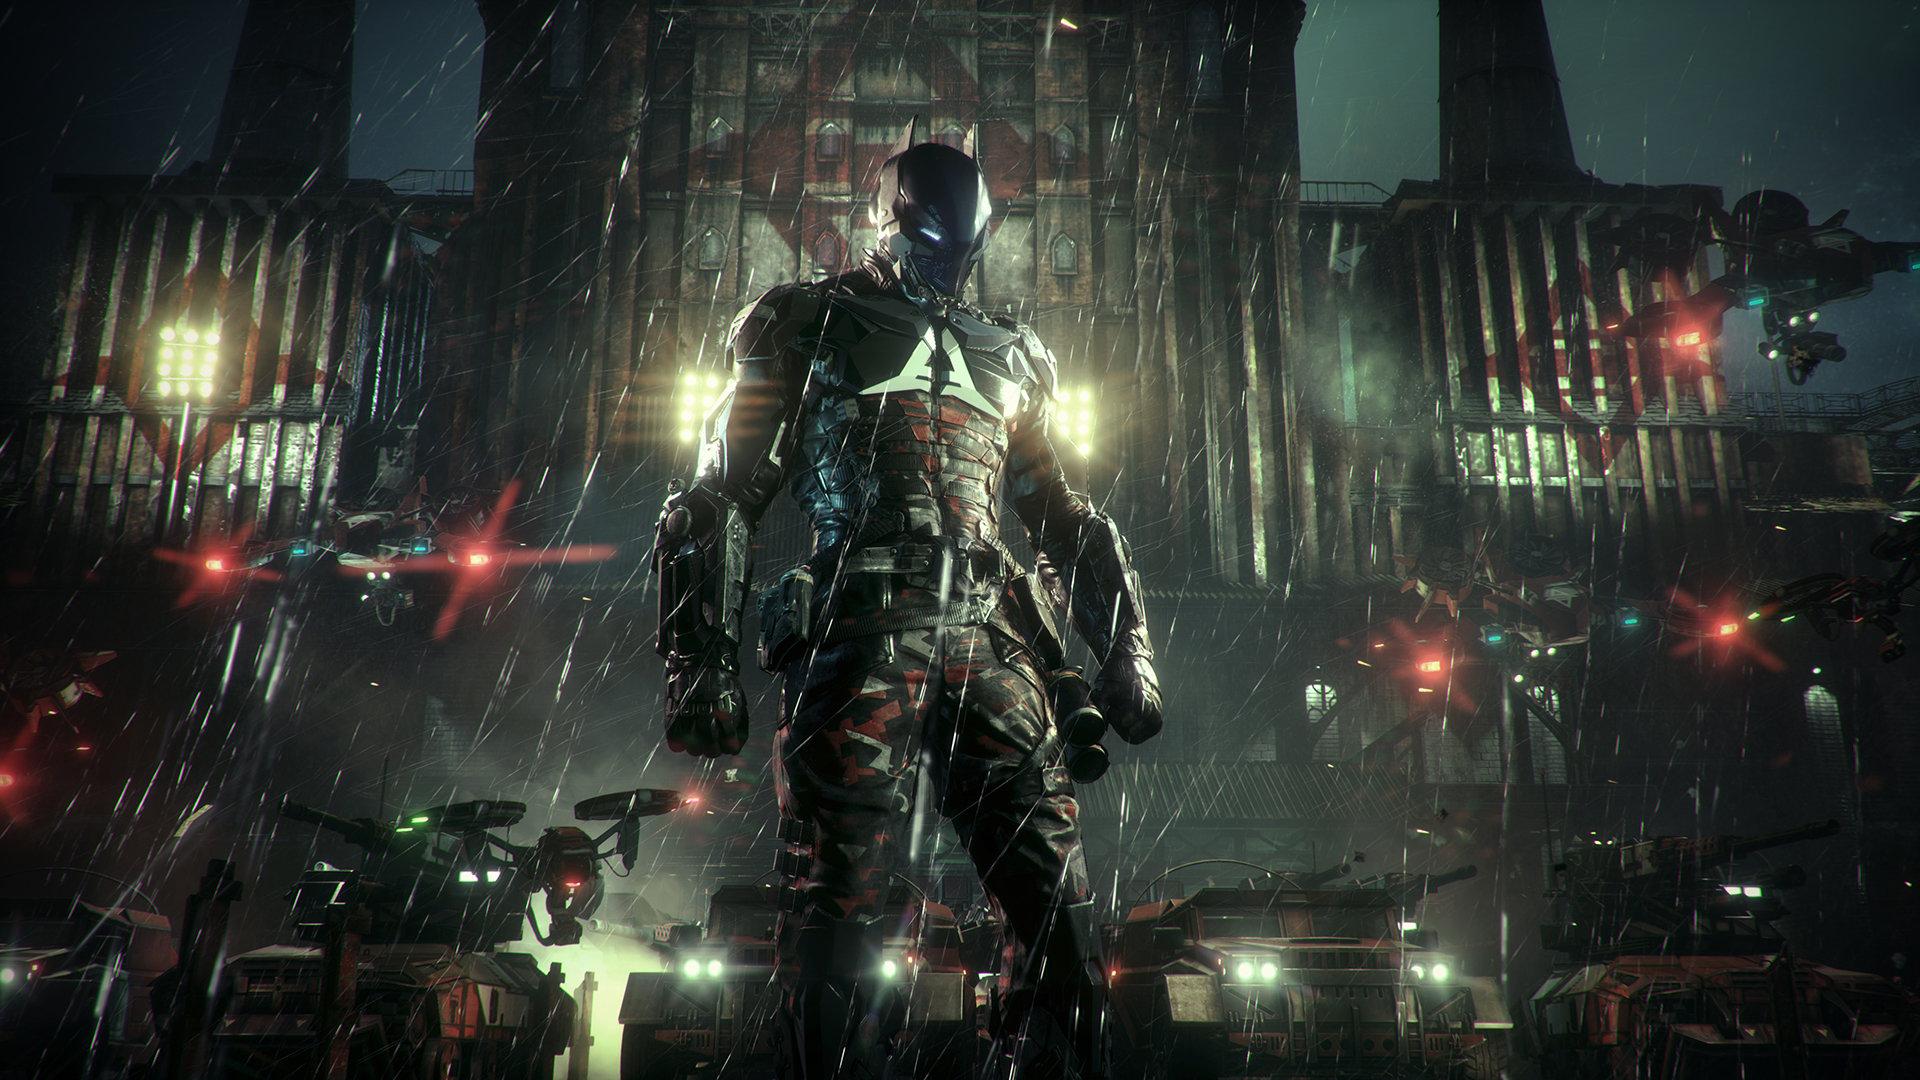 Recenze: Batman Arkham Knight – Strach nad Gothamem 10711